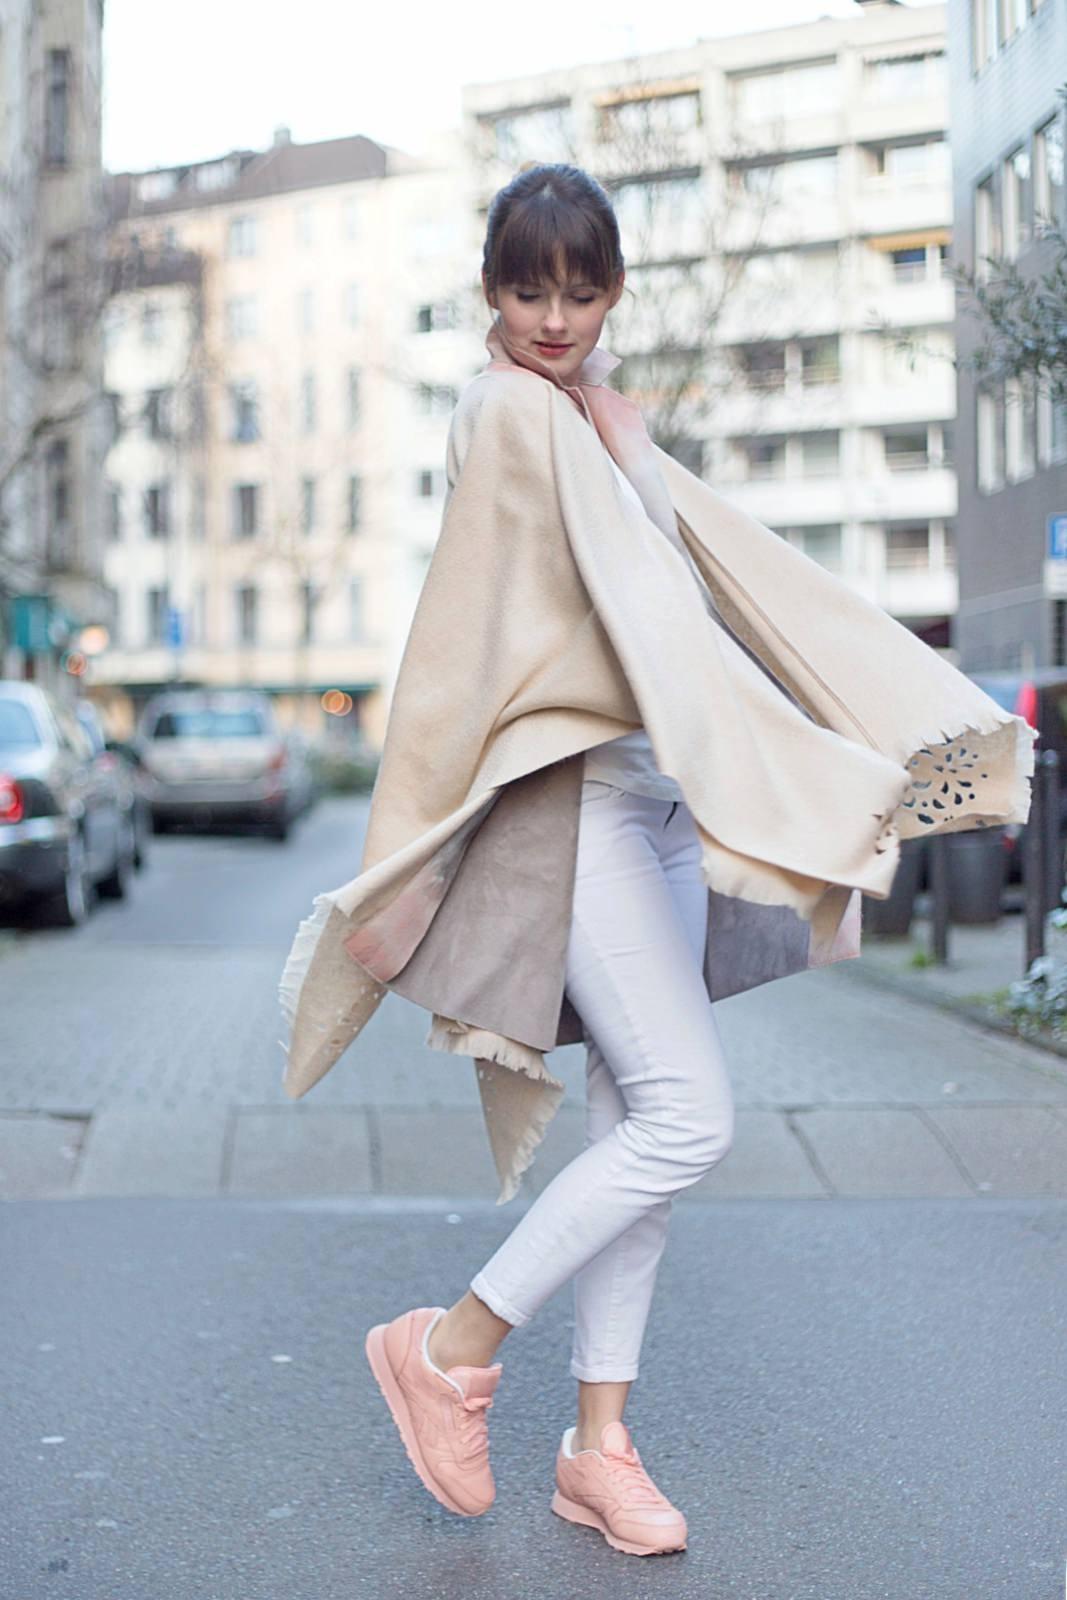 Das erste Outfit für den Frühling – Fraas Cape & Reebok Classics